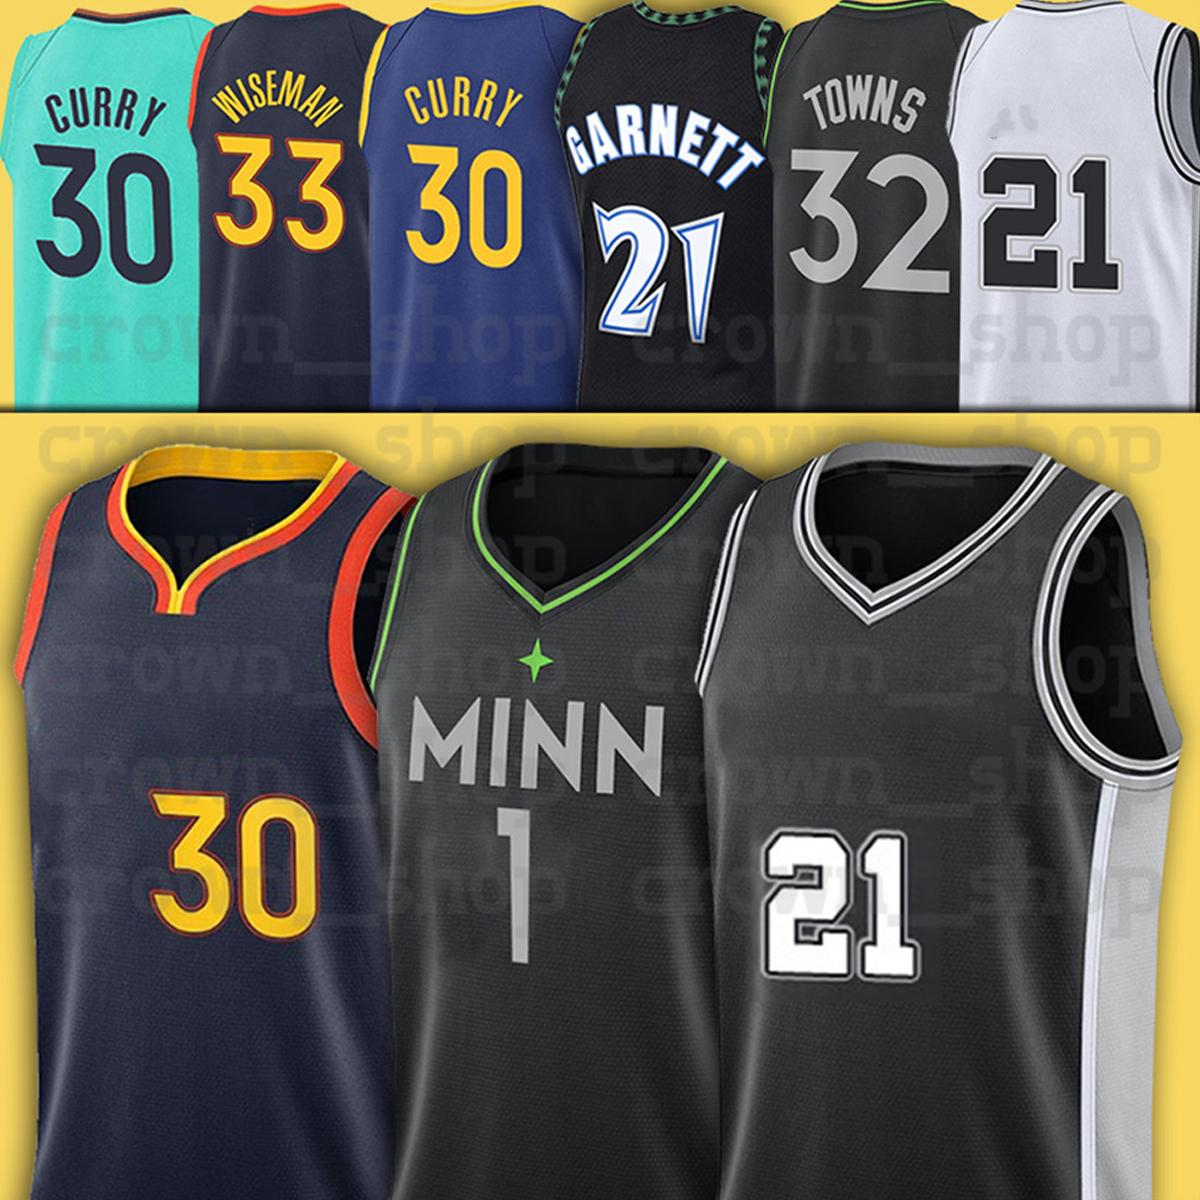 Curry 33 Wiseman 30 Stephen 1 Edwards Kevin 5 Garnett Karl-Anthony 32 Cidades 2021 City Basketball Jerseys